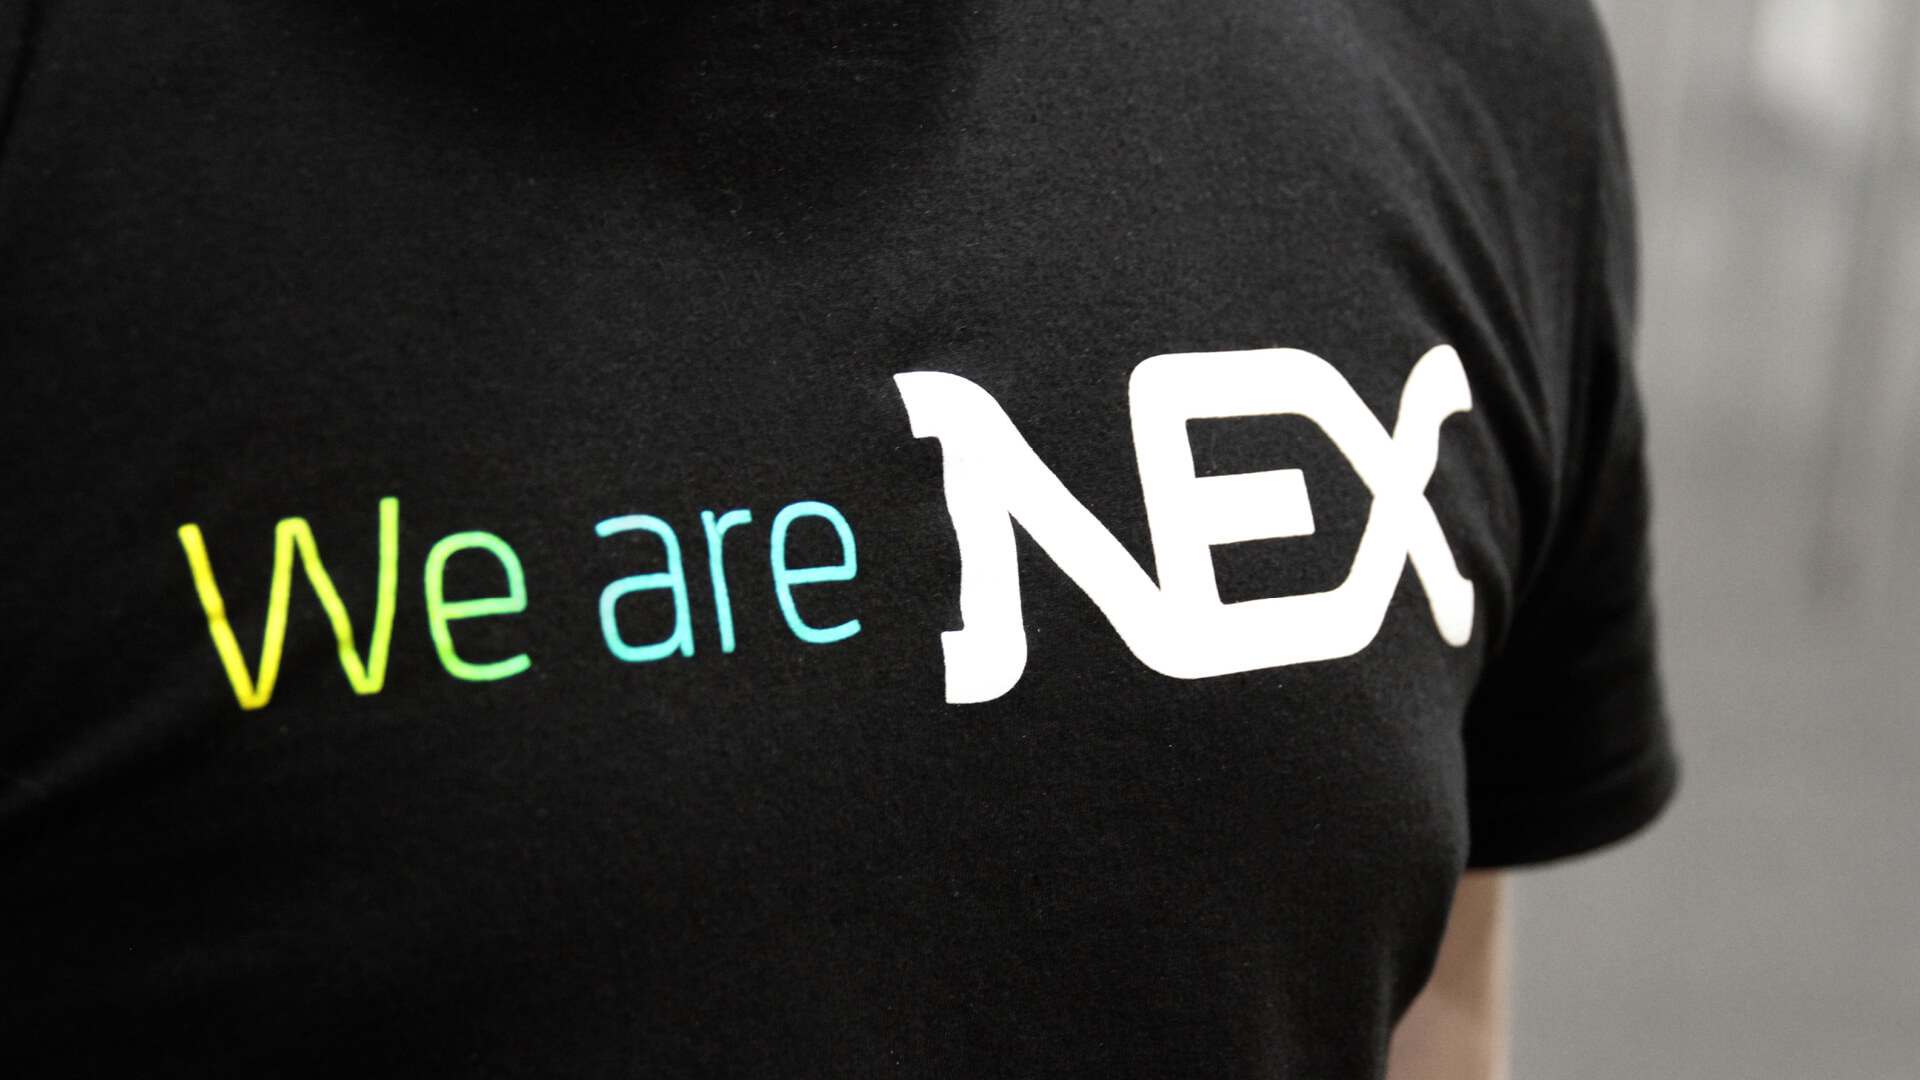 nex staff engagement campaign internal messaging promotion